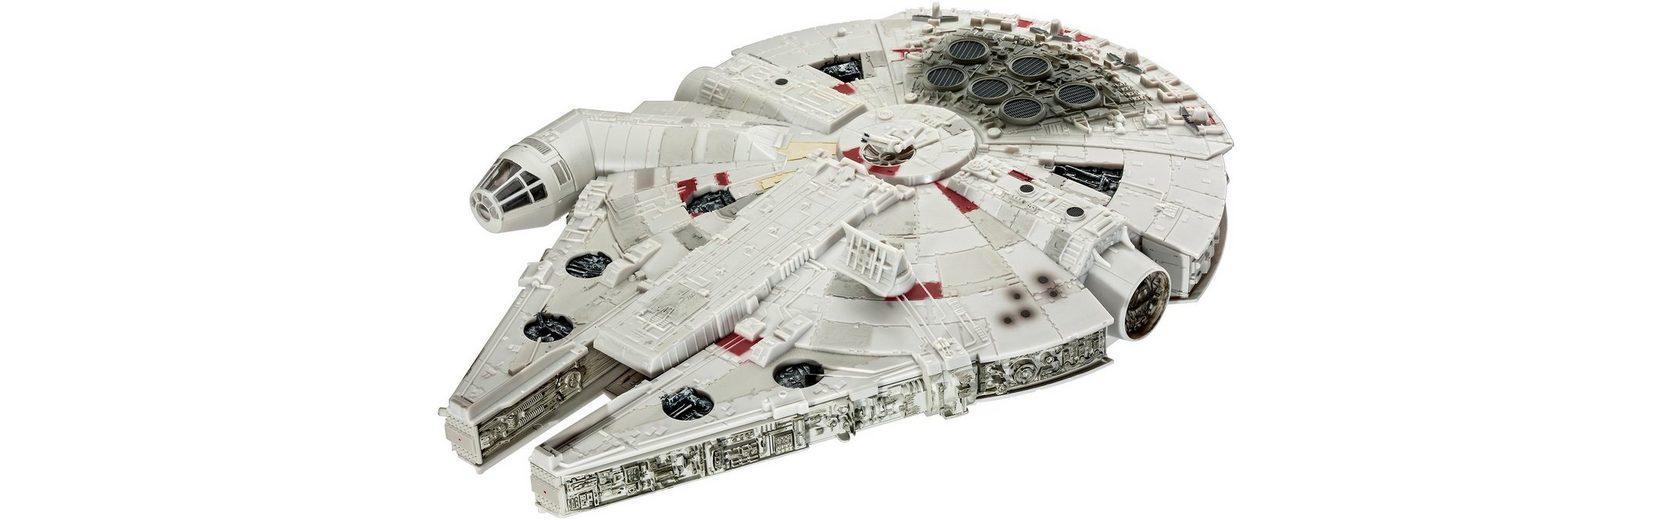 Revell® Modellbausatz Raumschiff, Maßstab 1:72, »Disney Star Wars Millennium Falcon«